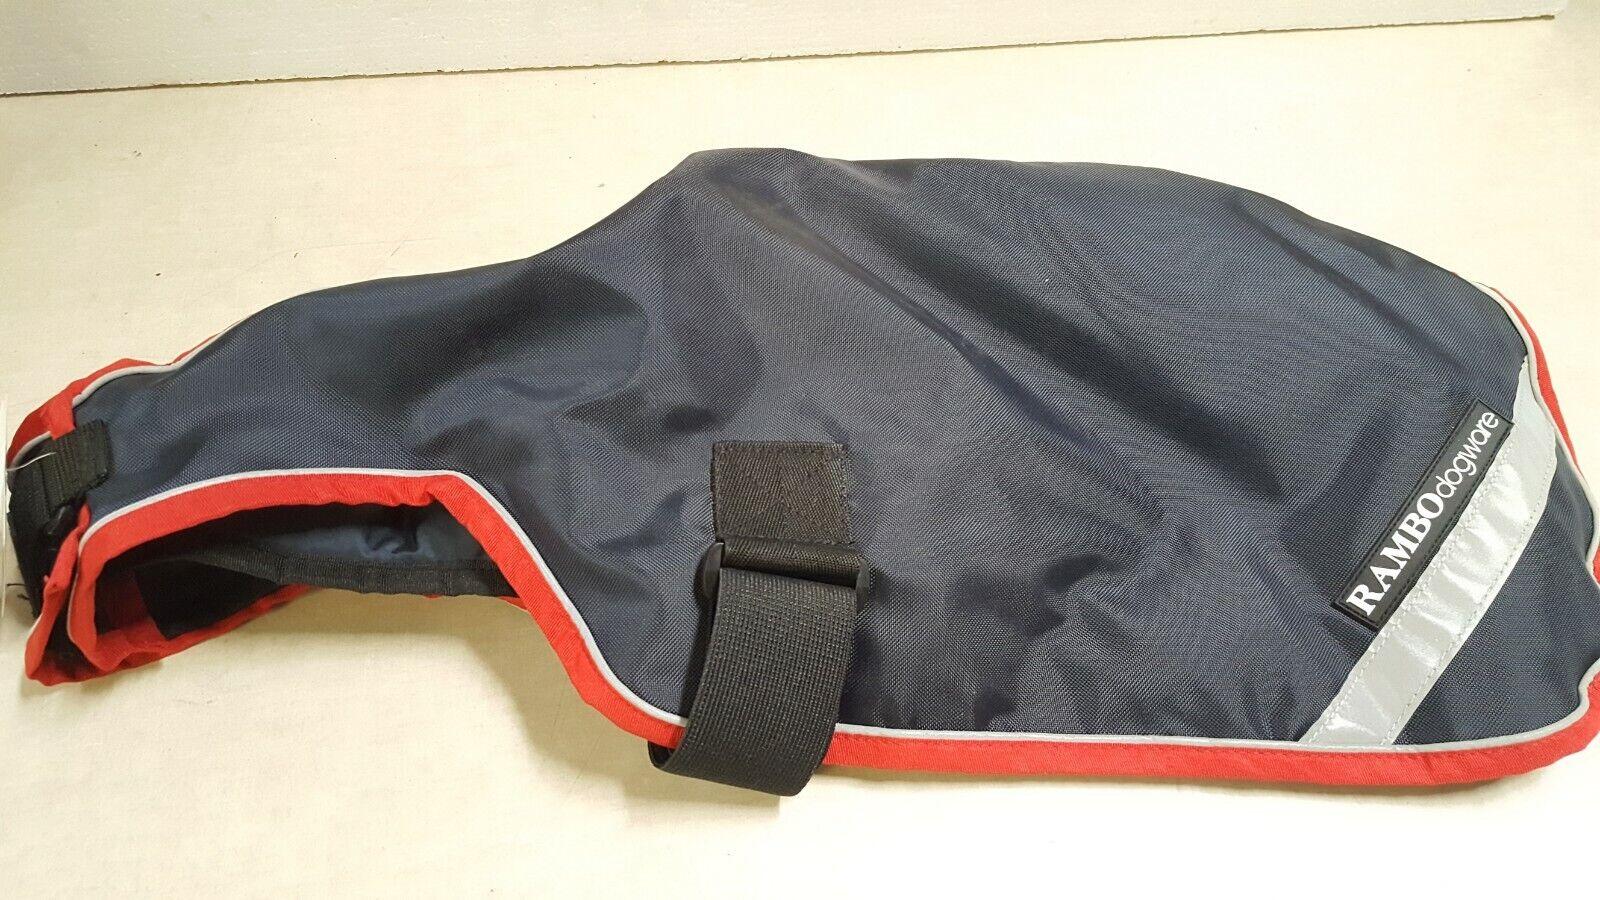 Rambo Waterproof Dog Blanket 100g - Navy Blau rot - Medium